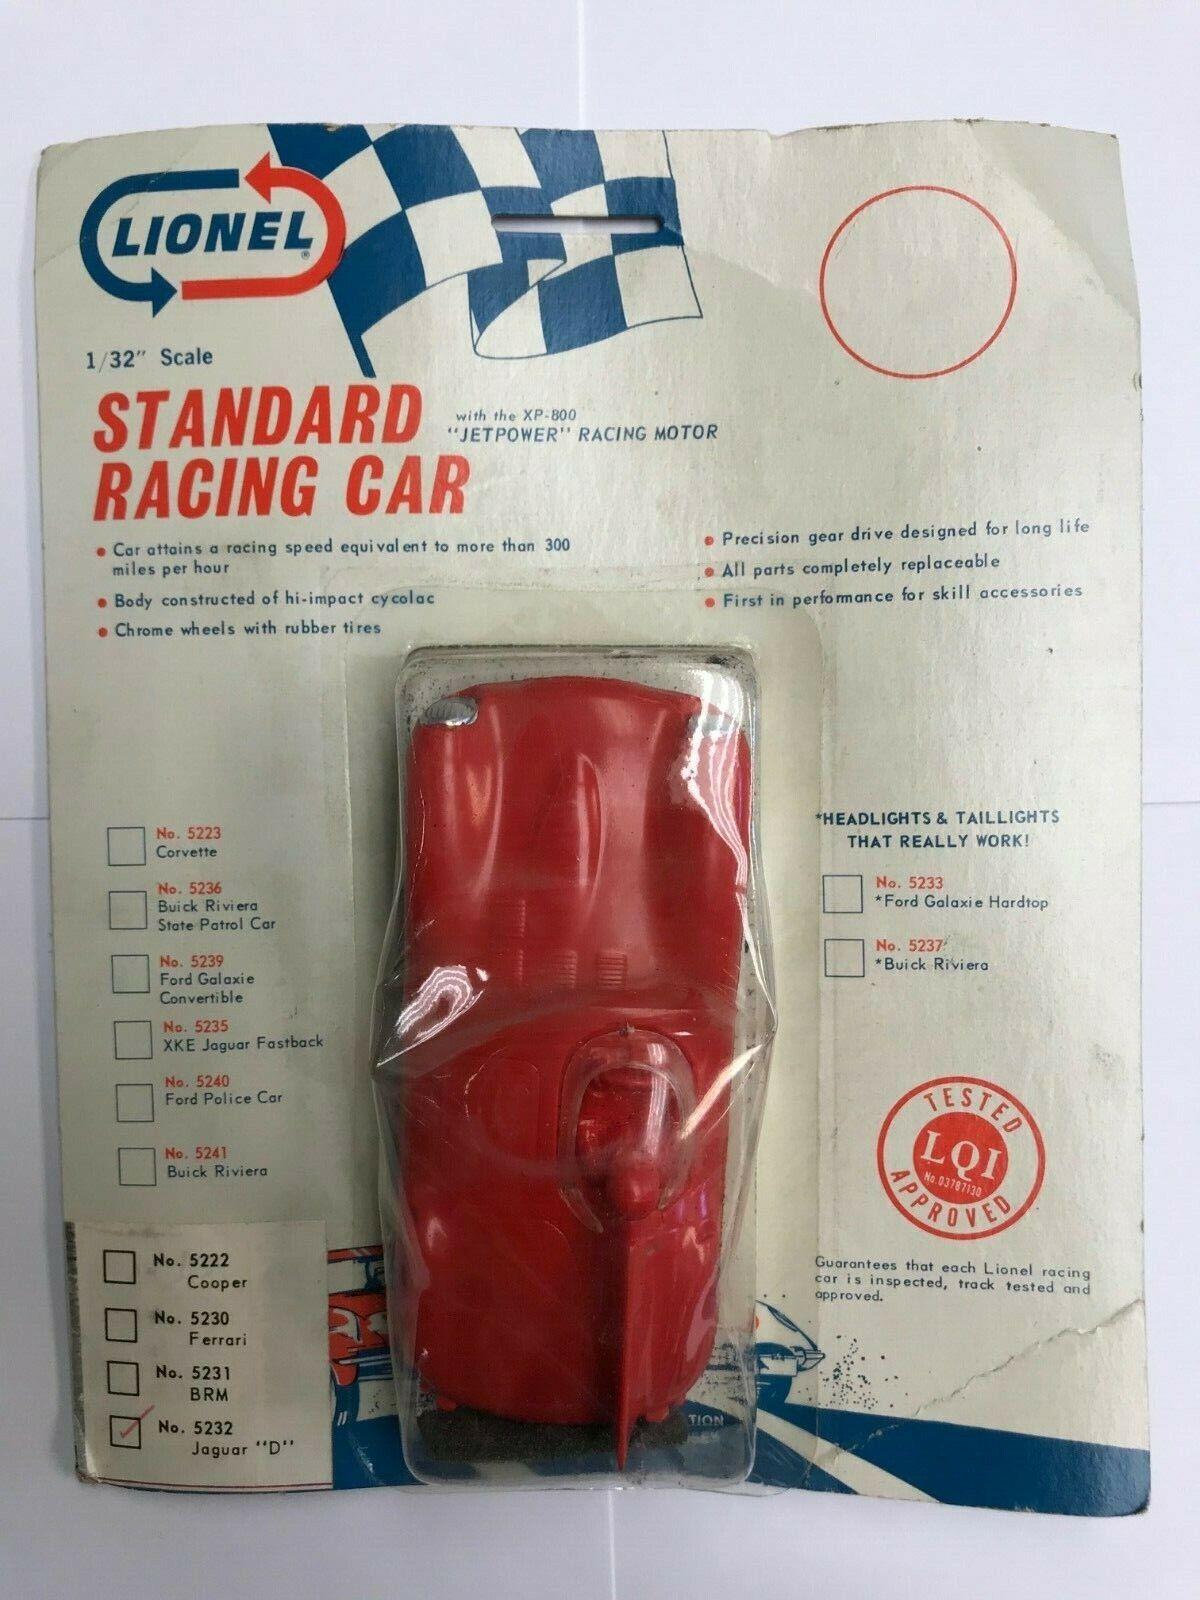 Lionel Standard Racing Car No 5232 Jaguar D 1 32 Scale Slot Car Sealed Packaging